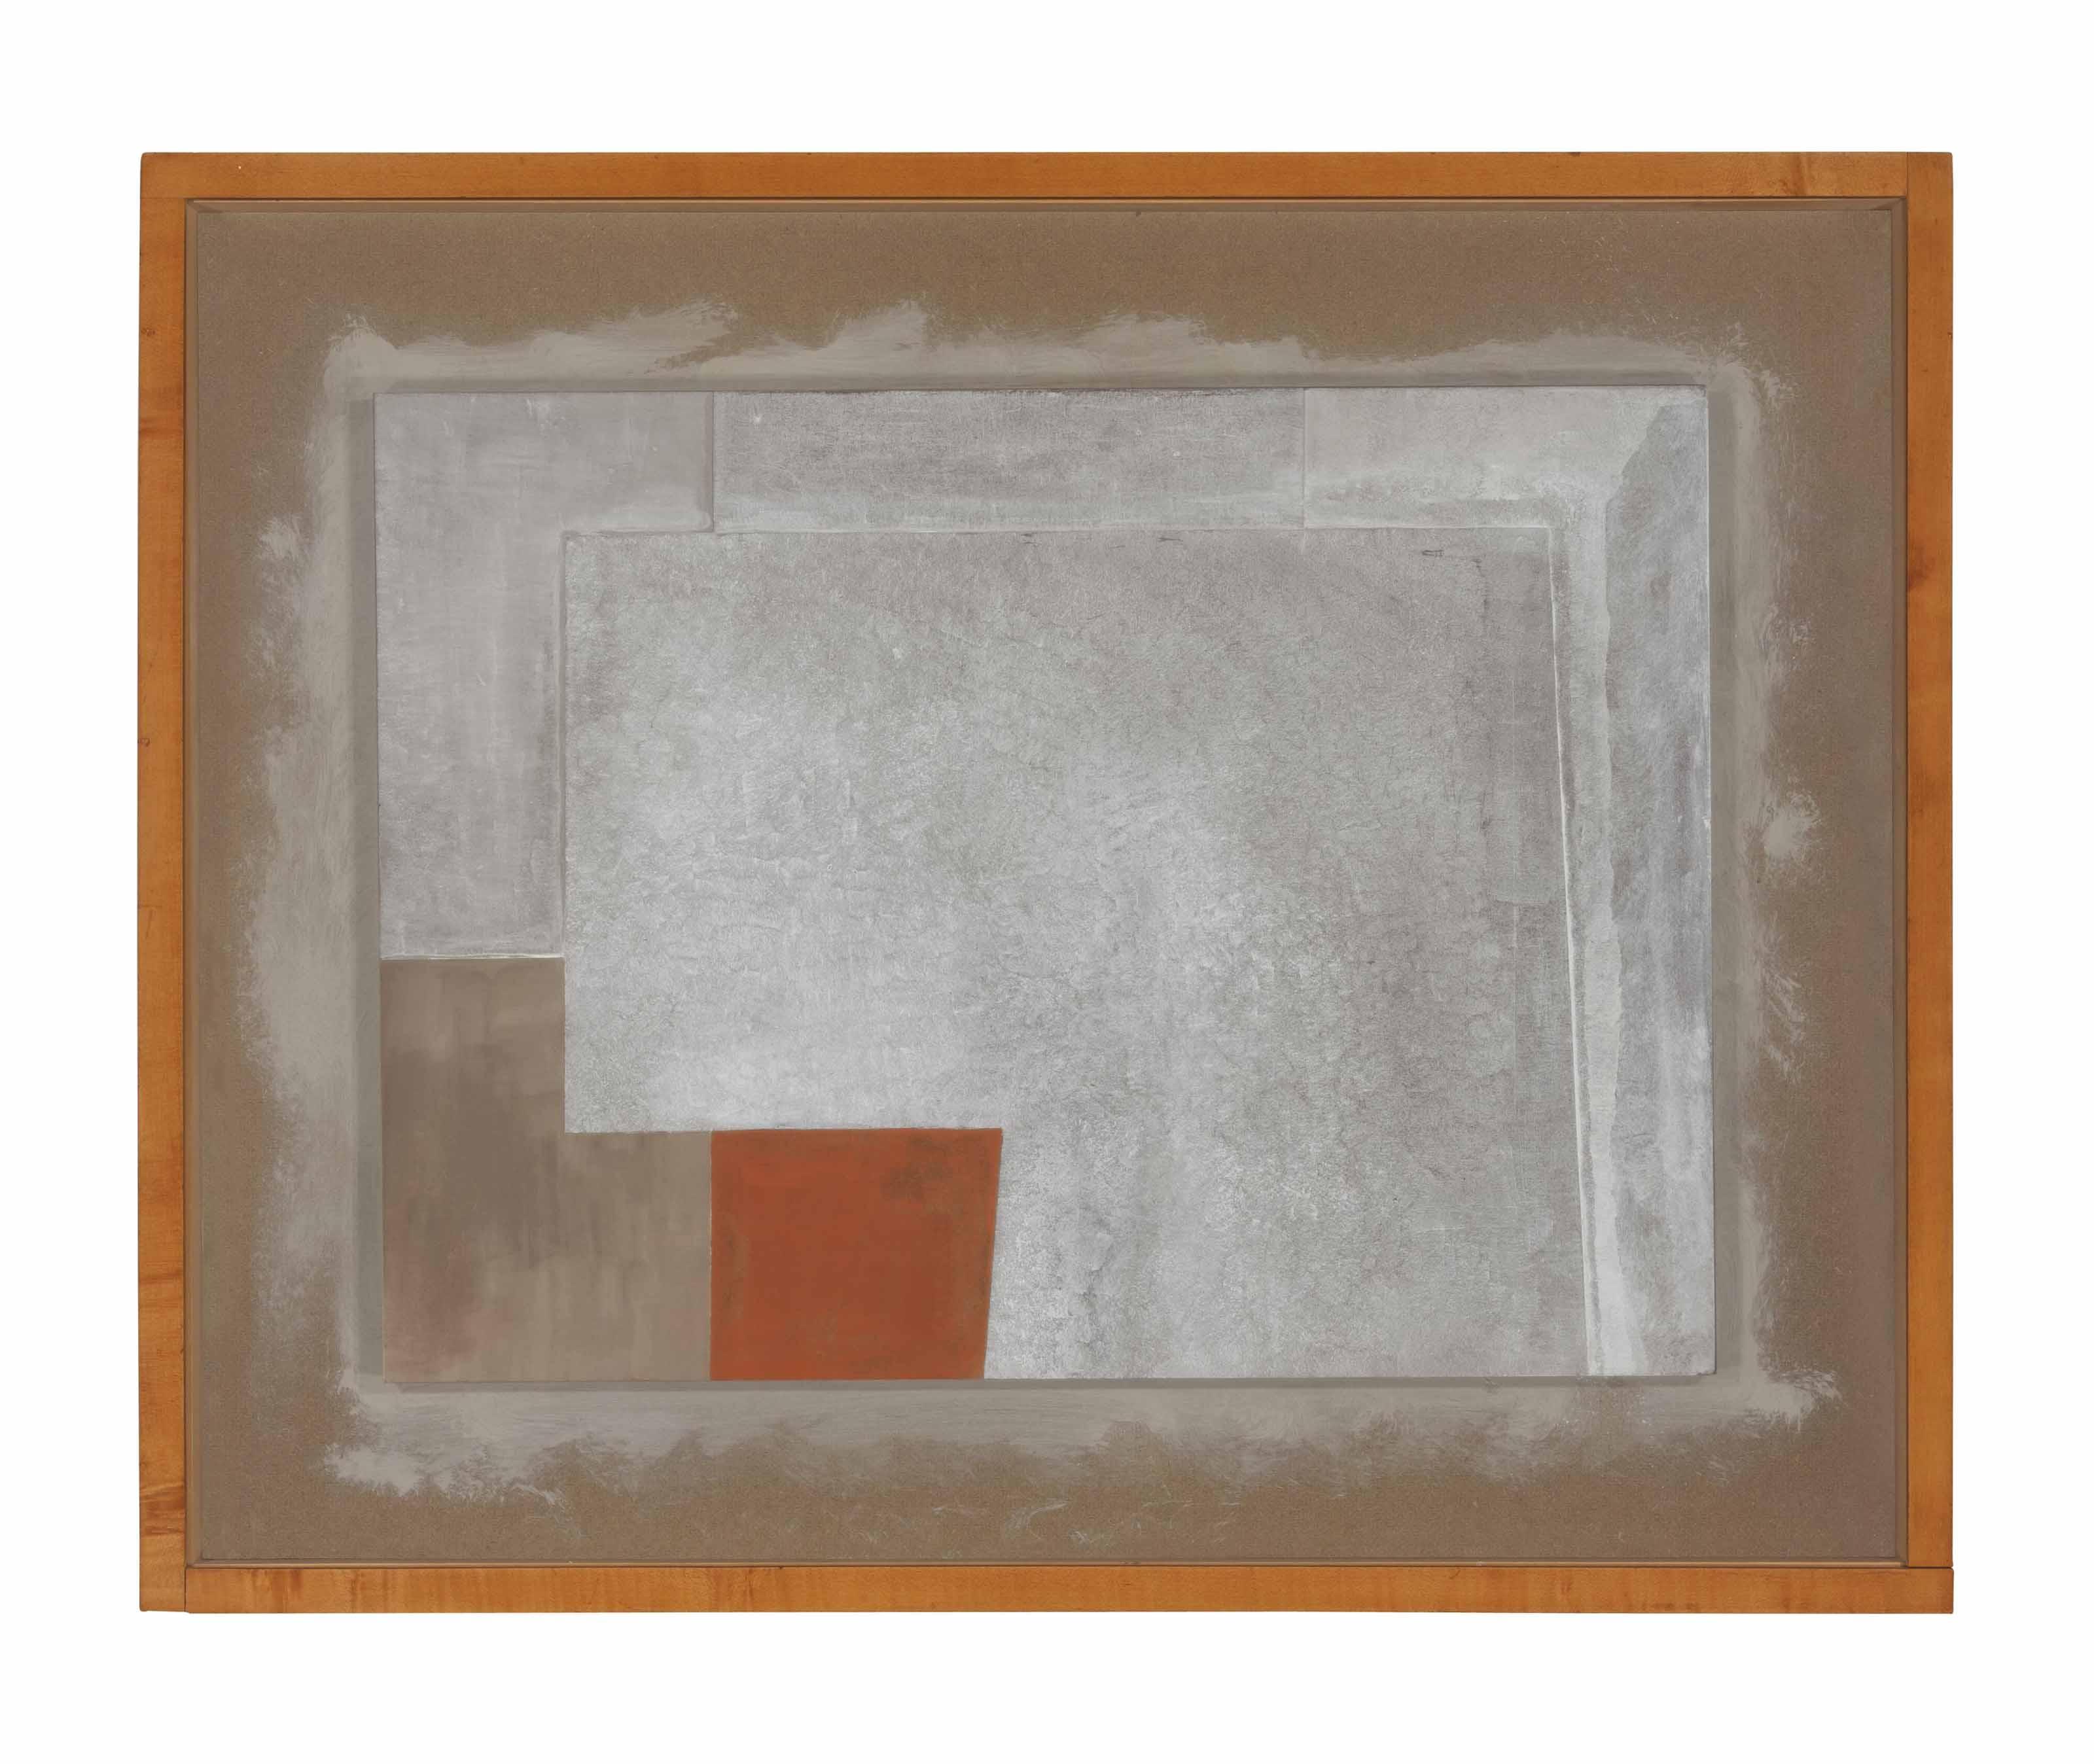 Ben Nicholson Paintings For Sale